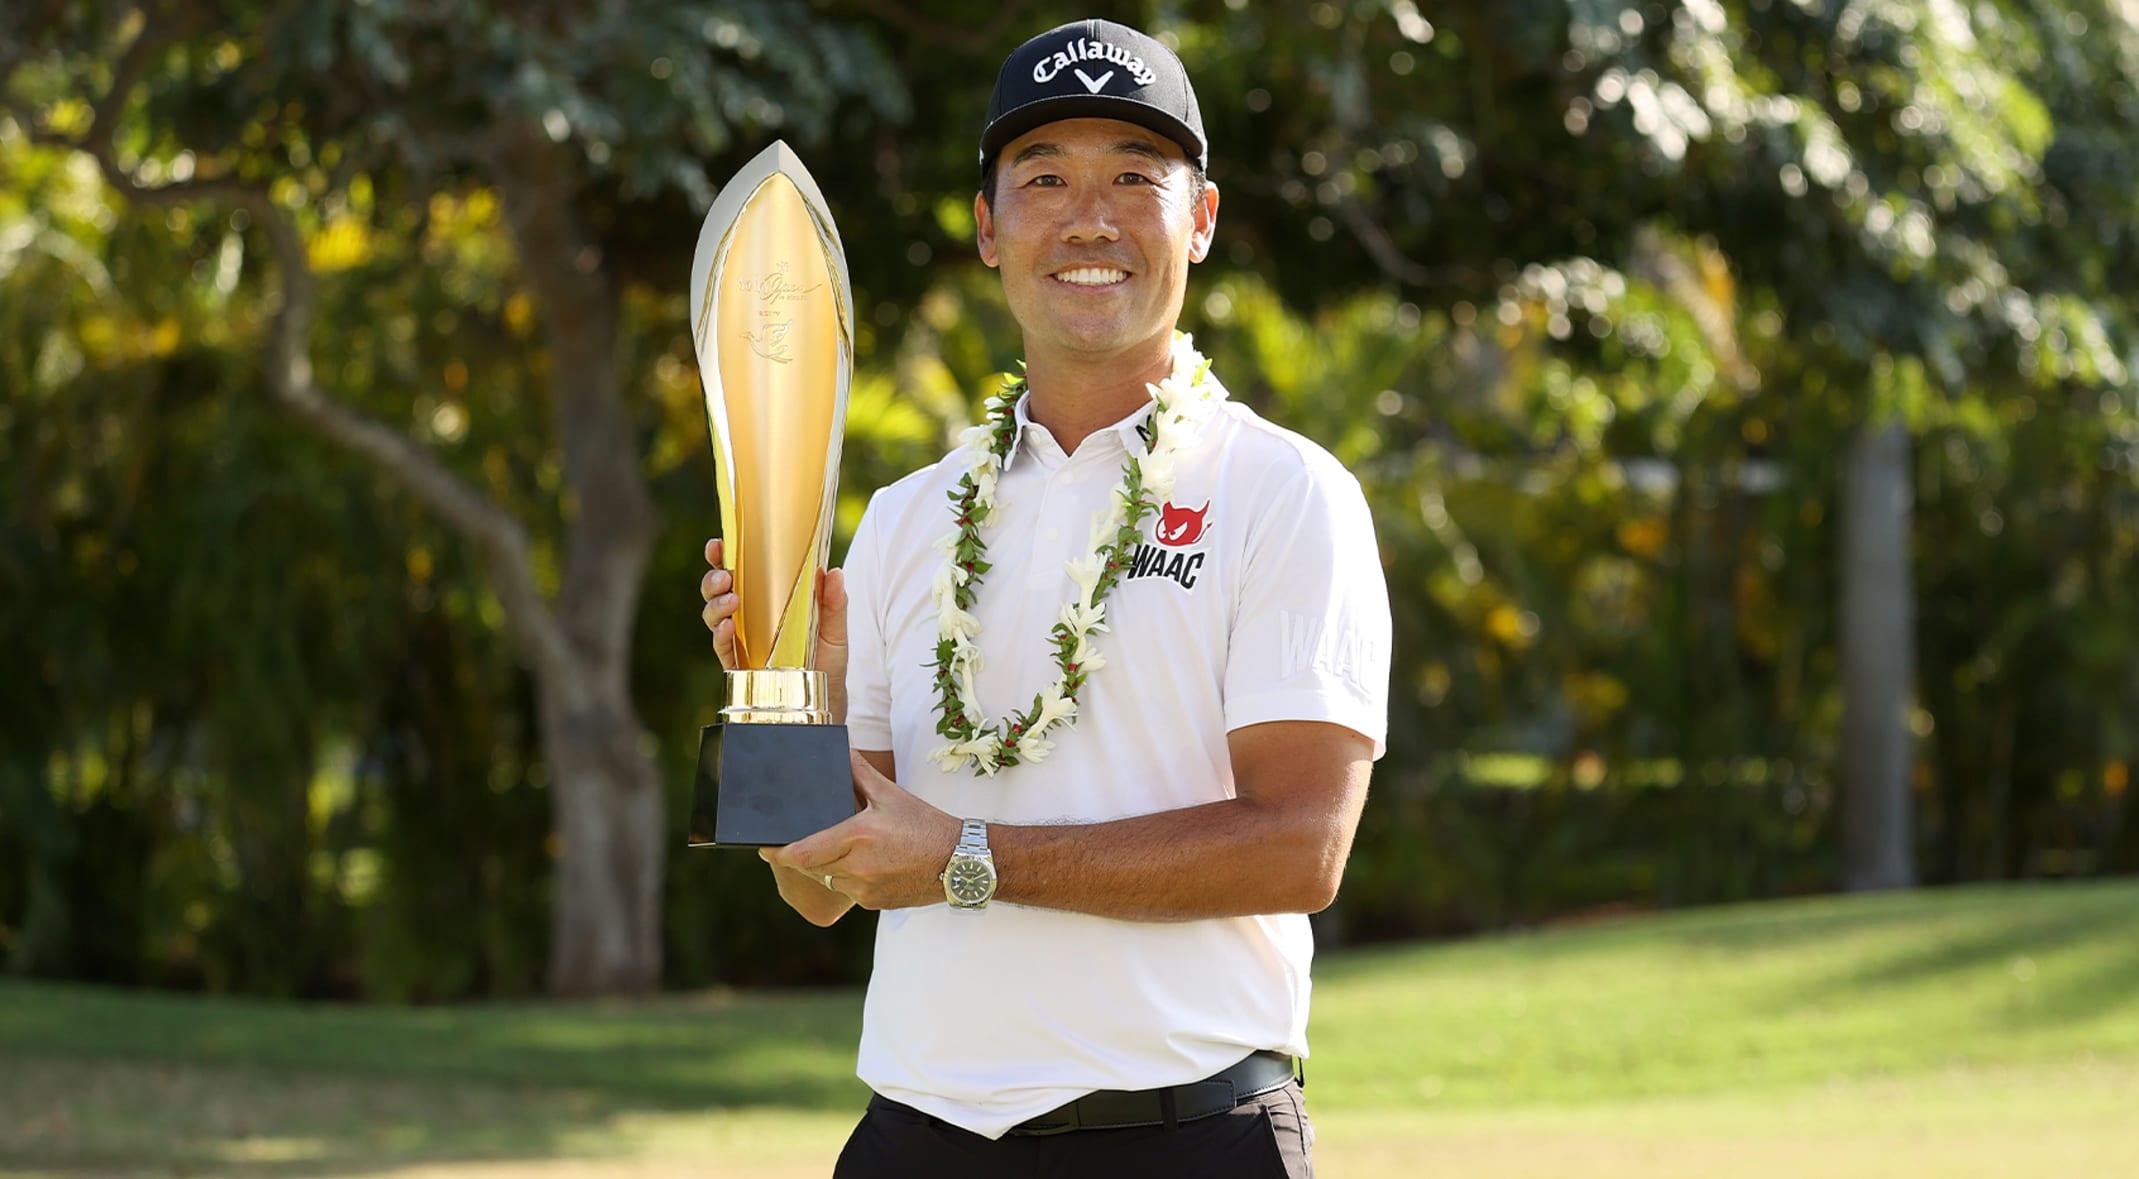 Na wins Sony Open in Hawaii after final-hole birdie